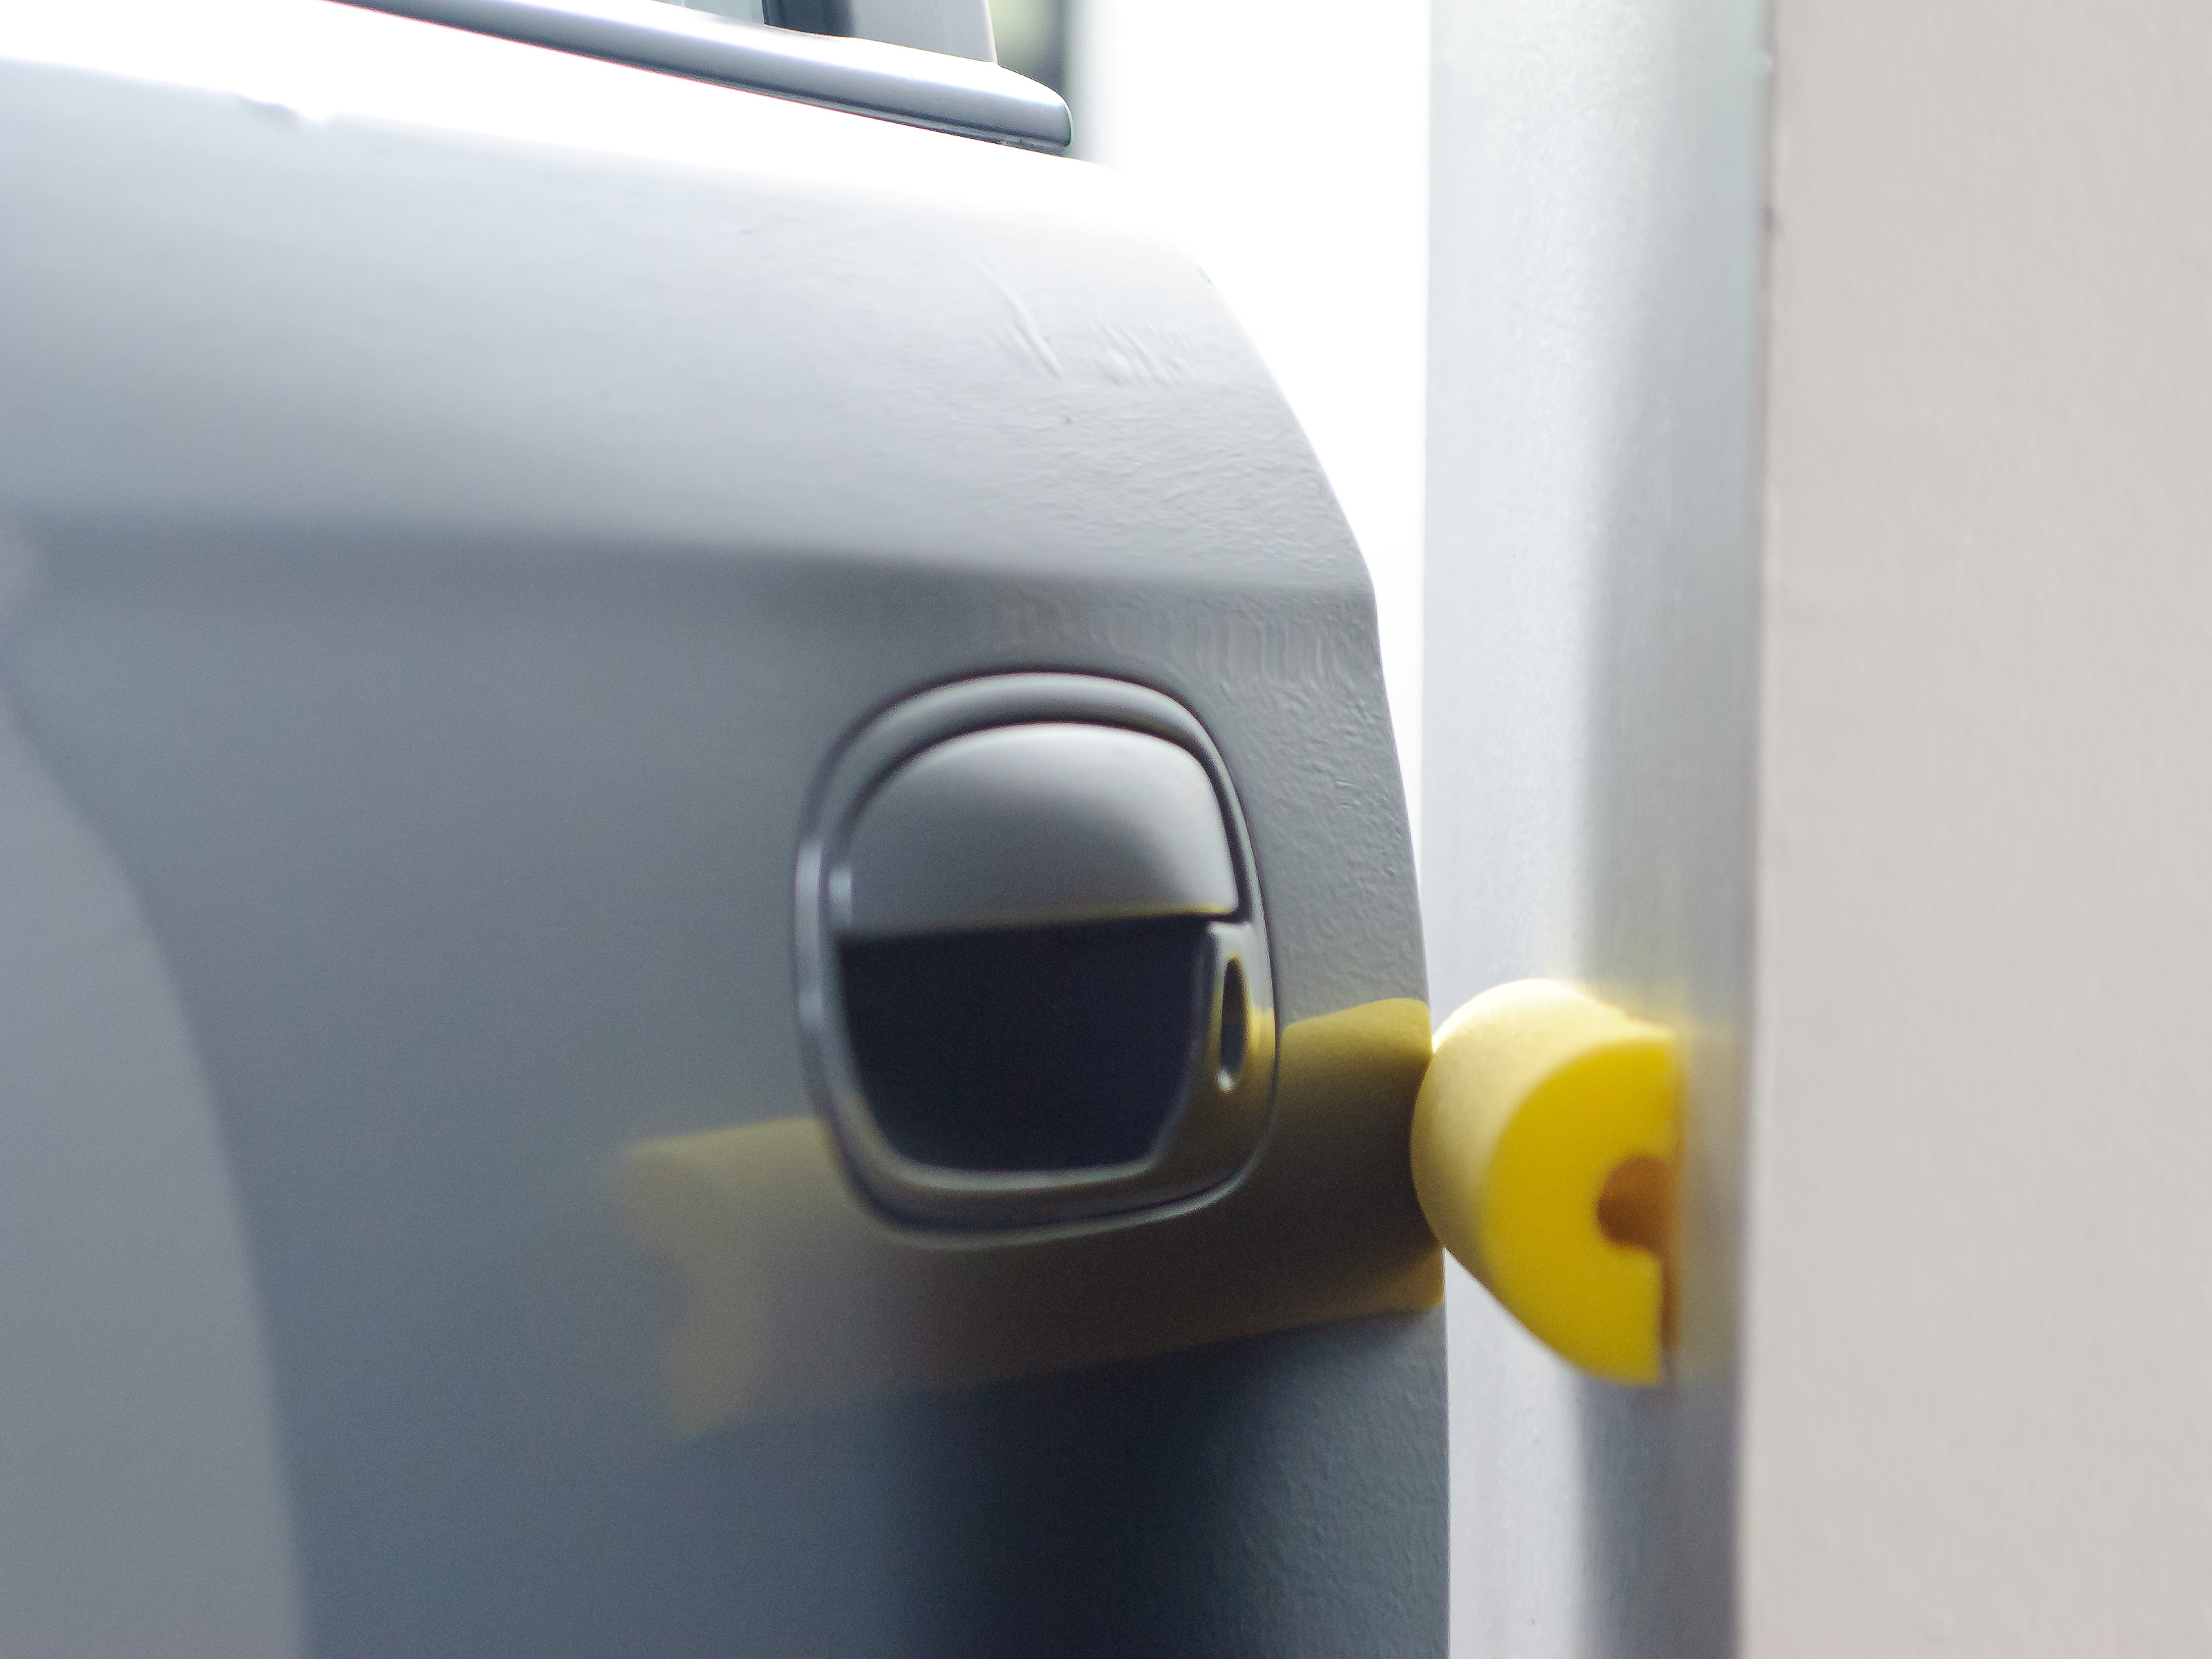 garage door protectorHow to Make a Door Bumper For Your Garage with a Pool Noodle